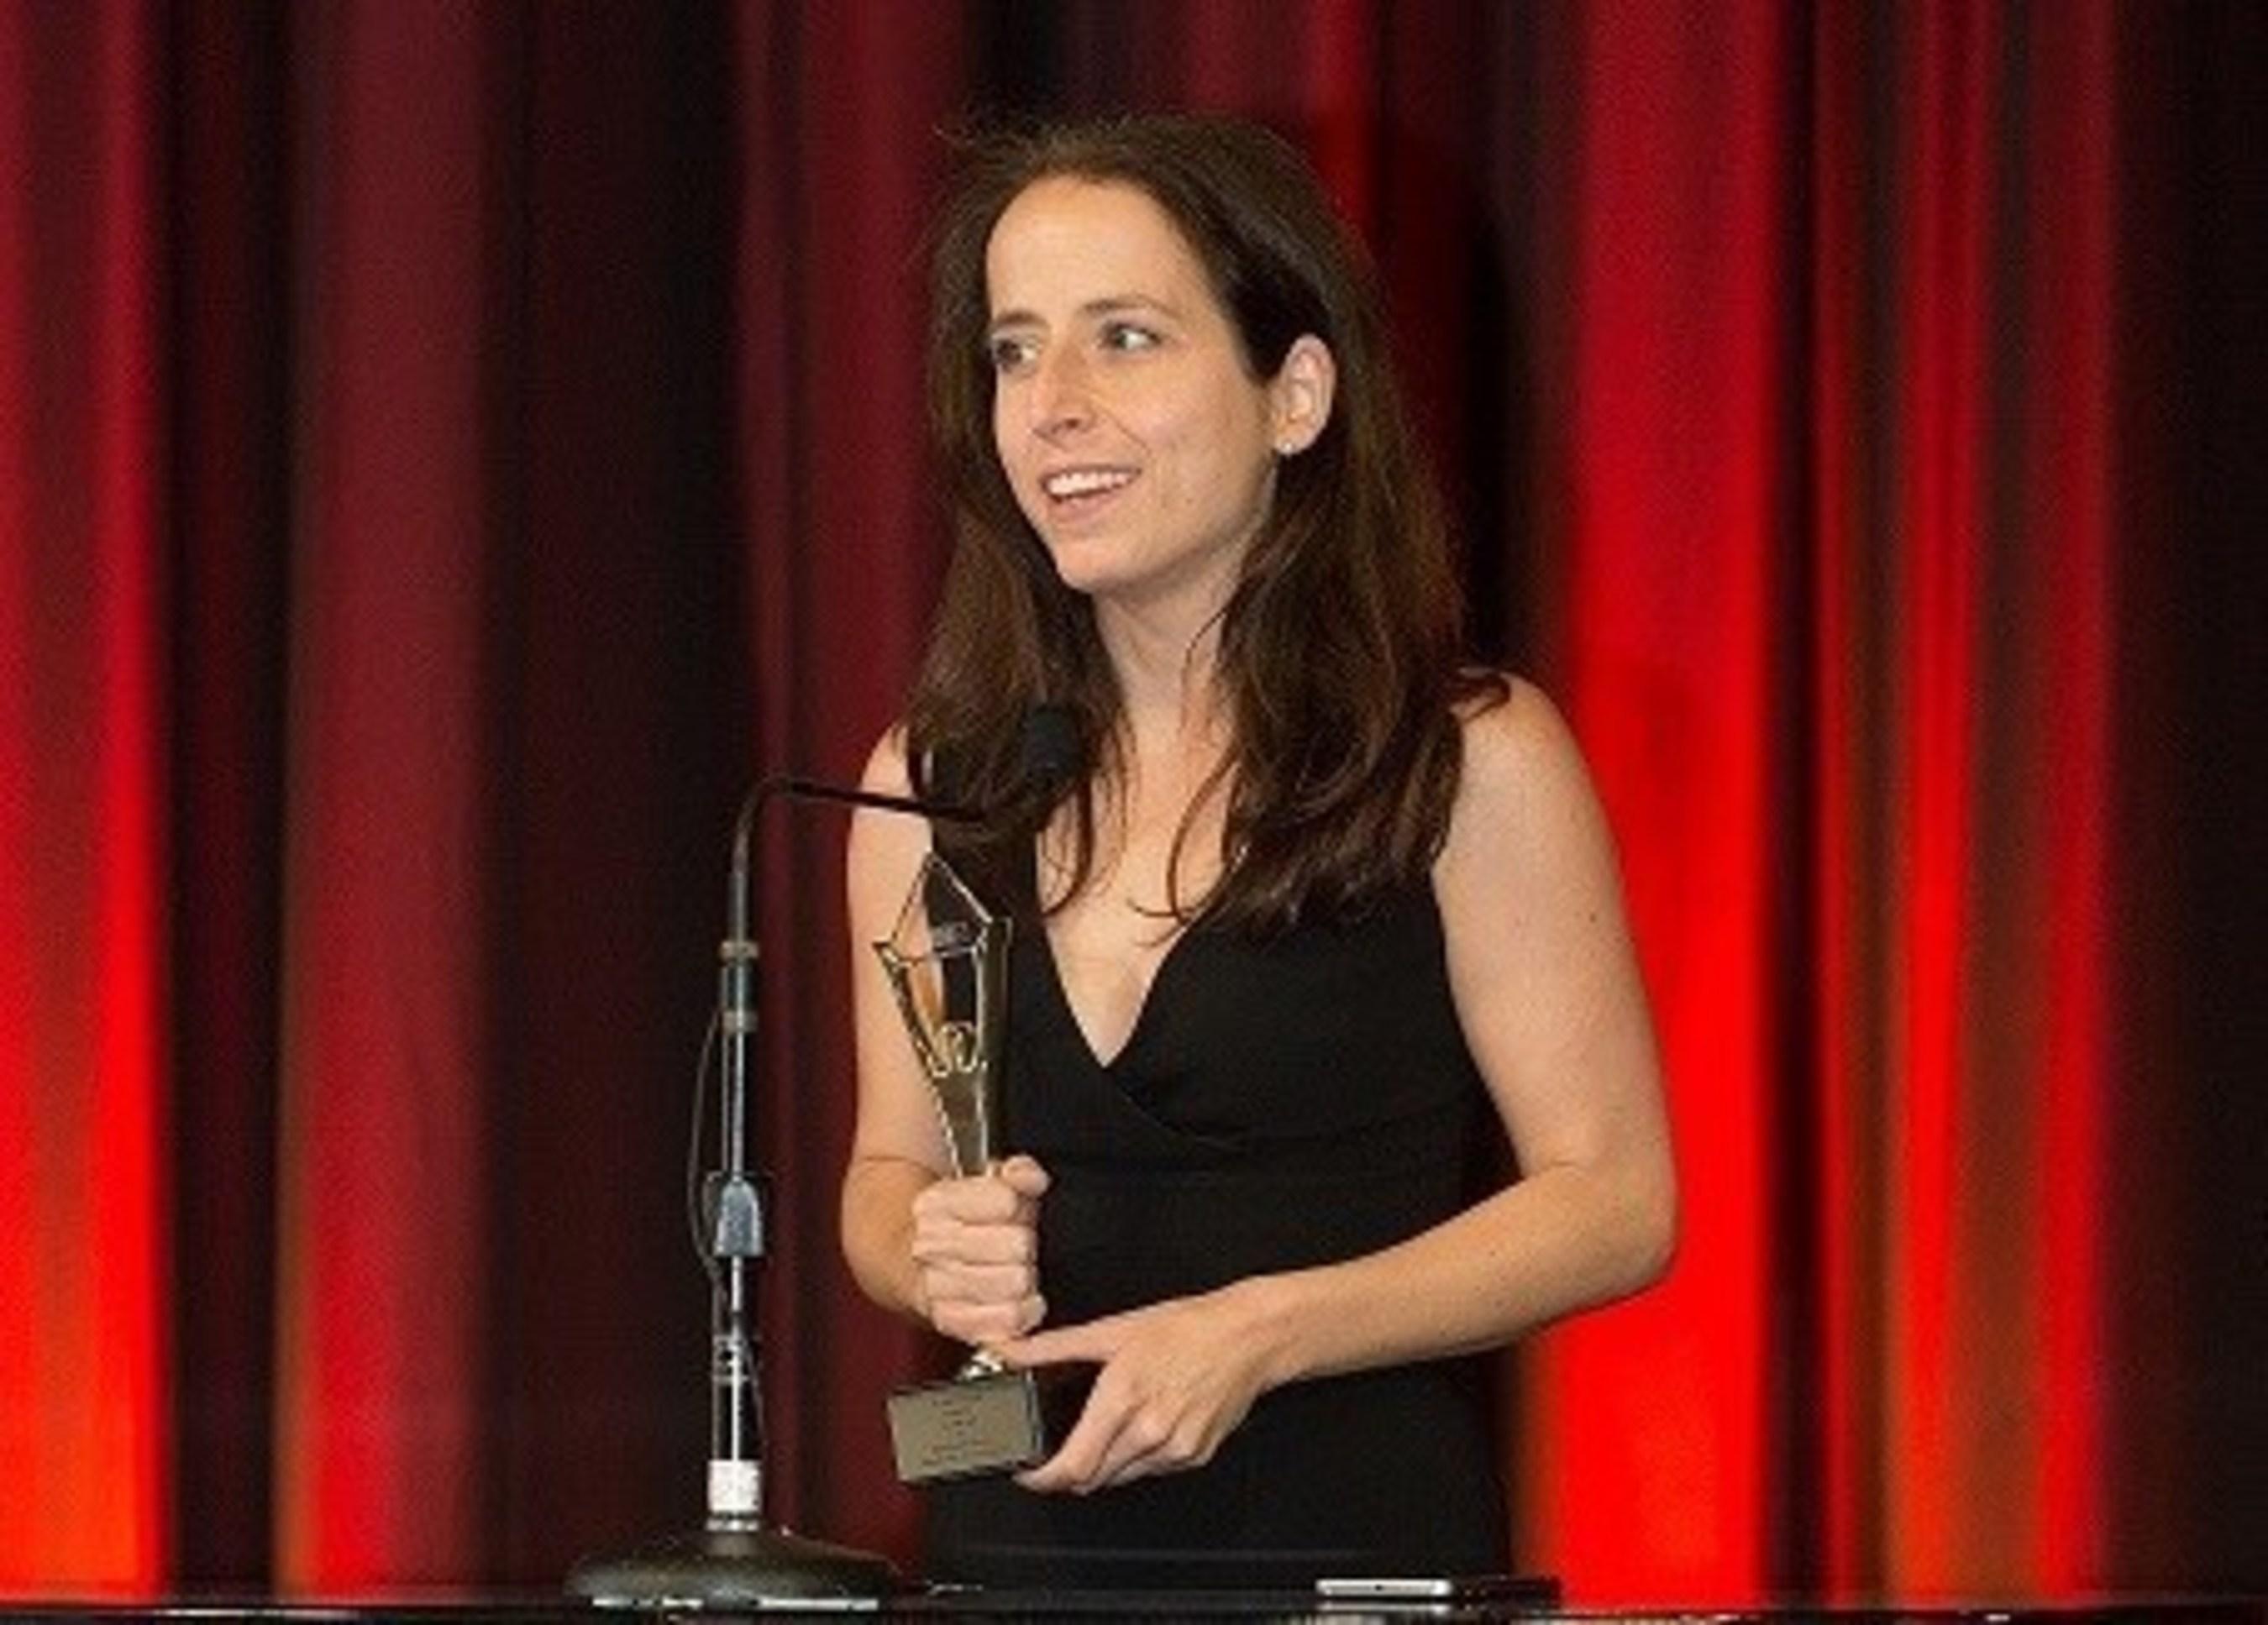 Jana Uhlig, COO of ADELLO, Wins Gold Stevie® Award in Female Executive of the Year